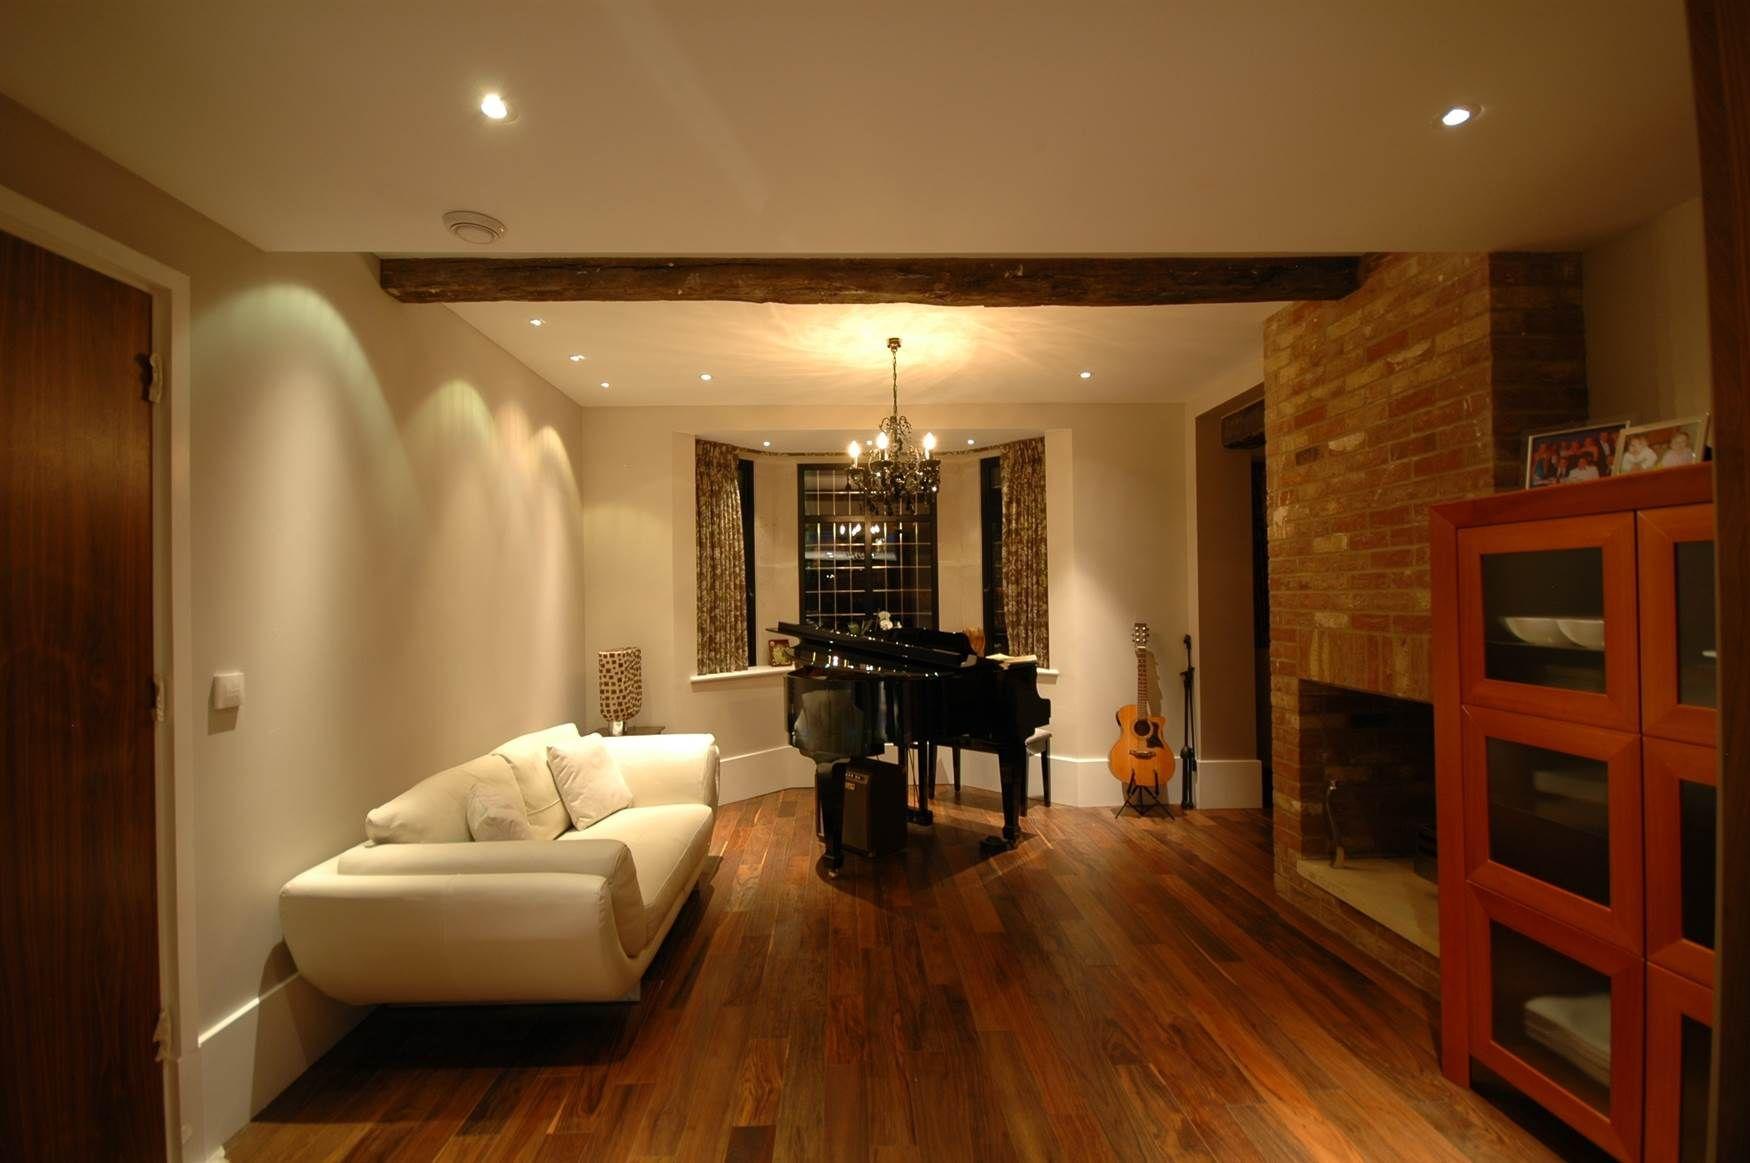 Living Room Lighting Design Mr Resistor Downlights And Pendant In